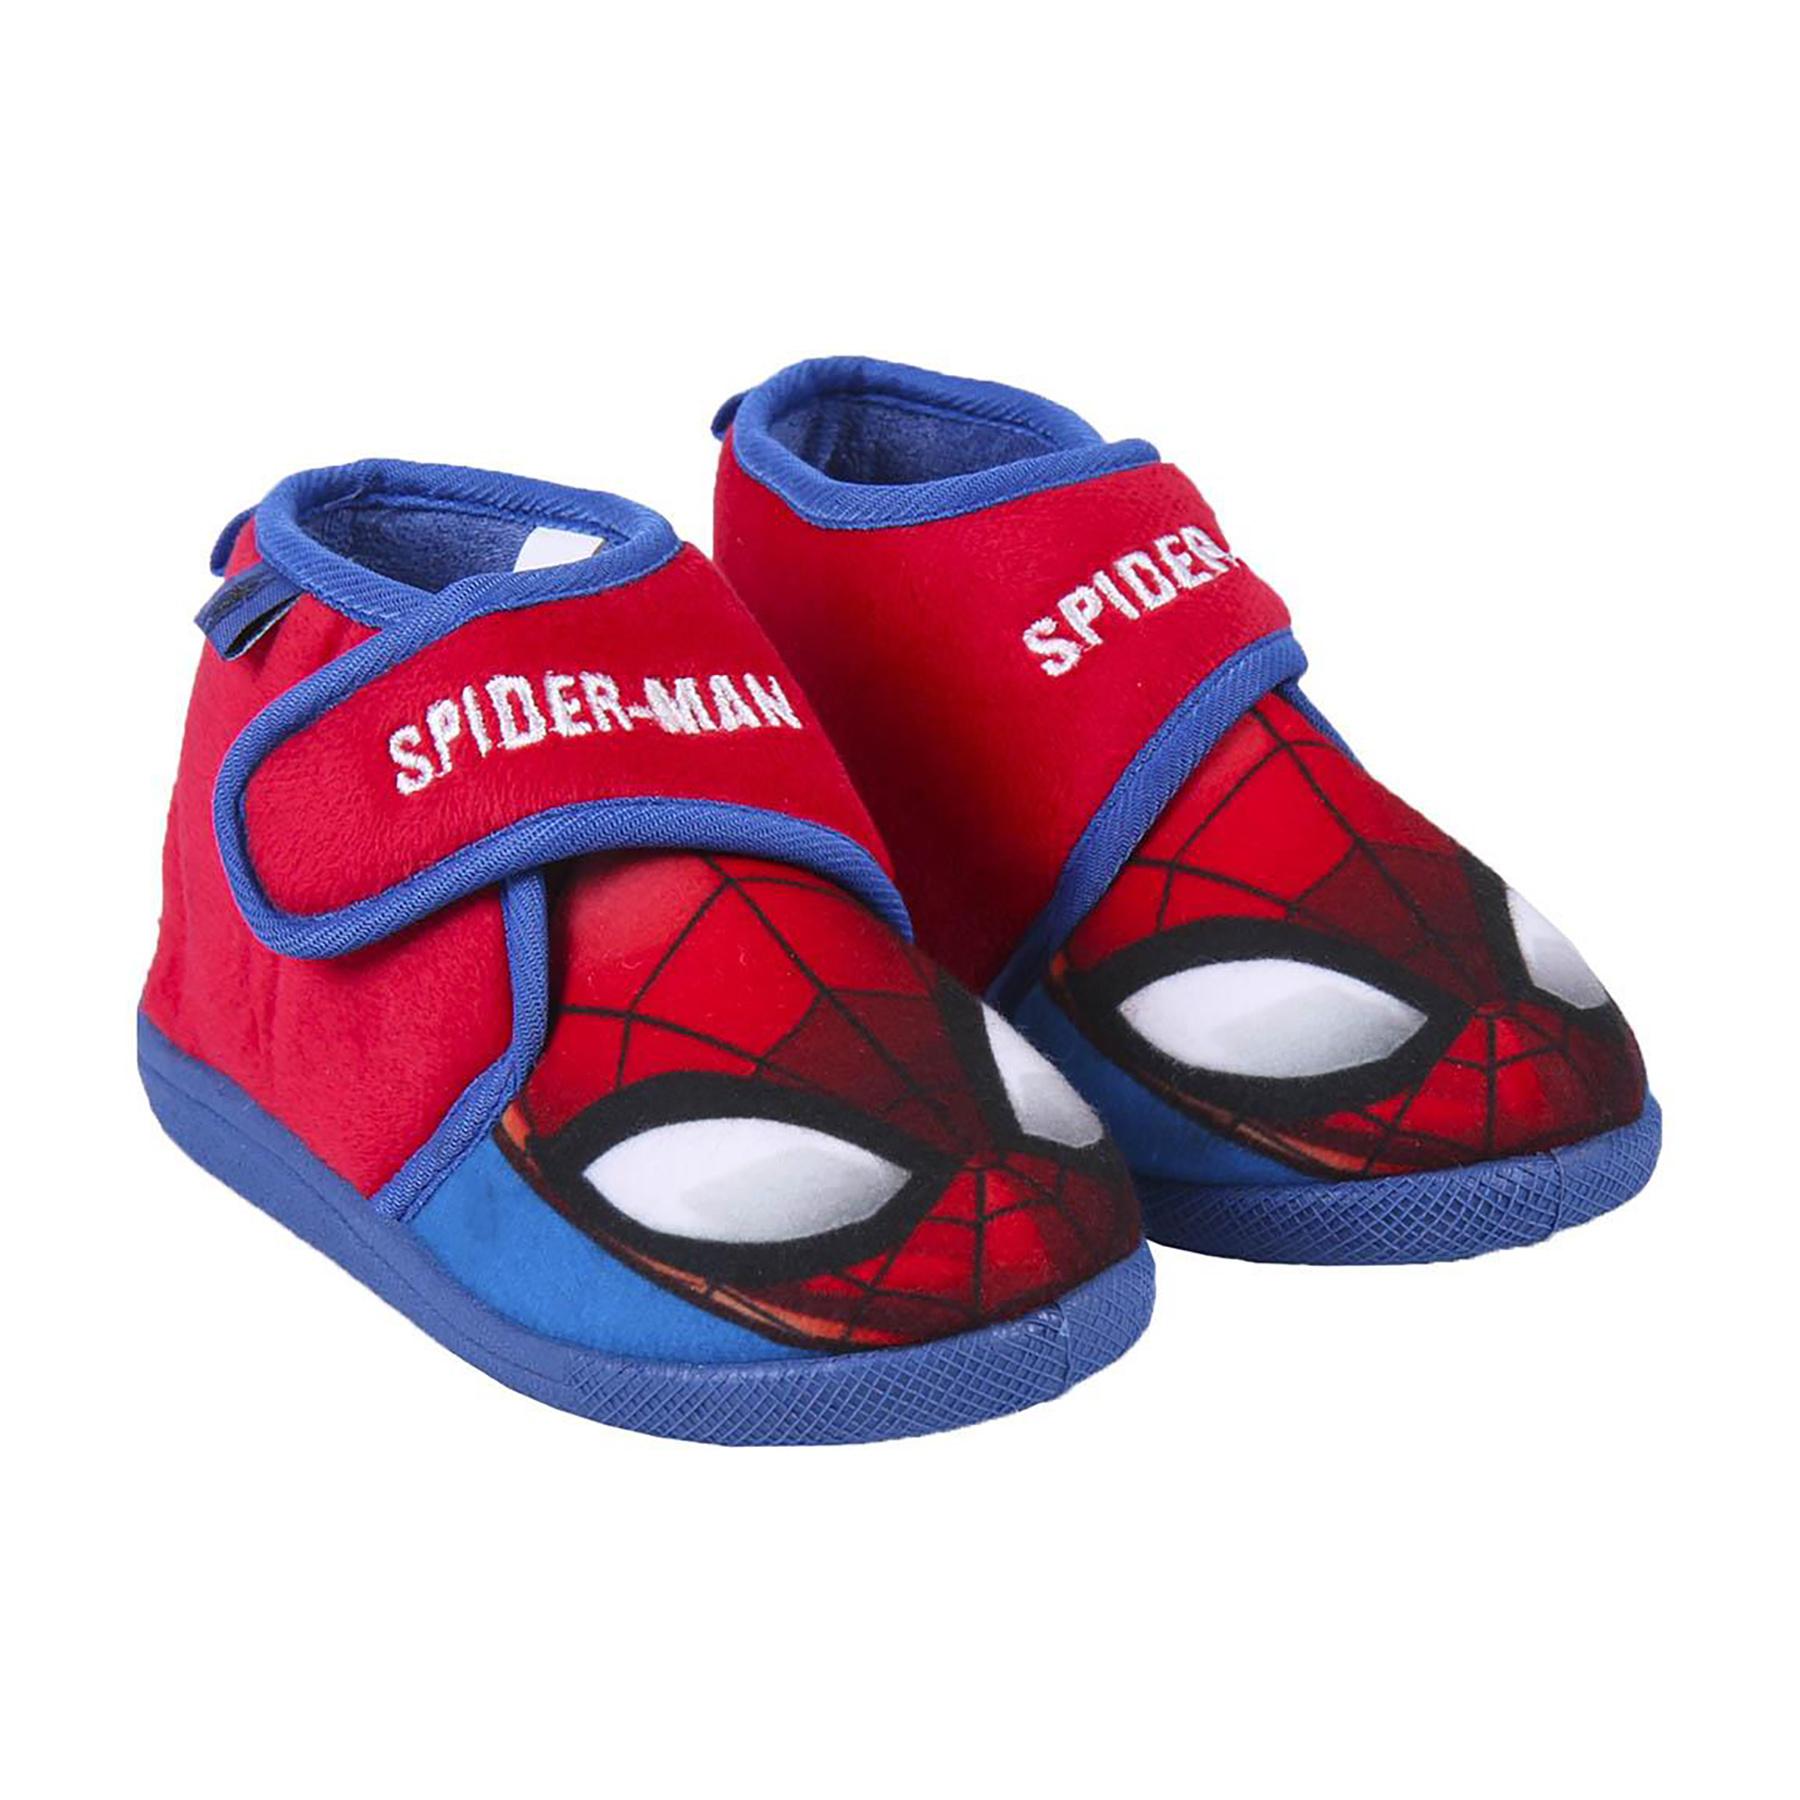 Pantofole Spiderman  23 24 25 26 27 28